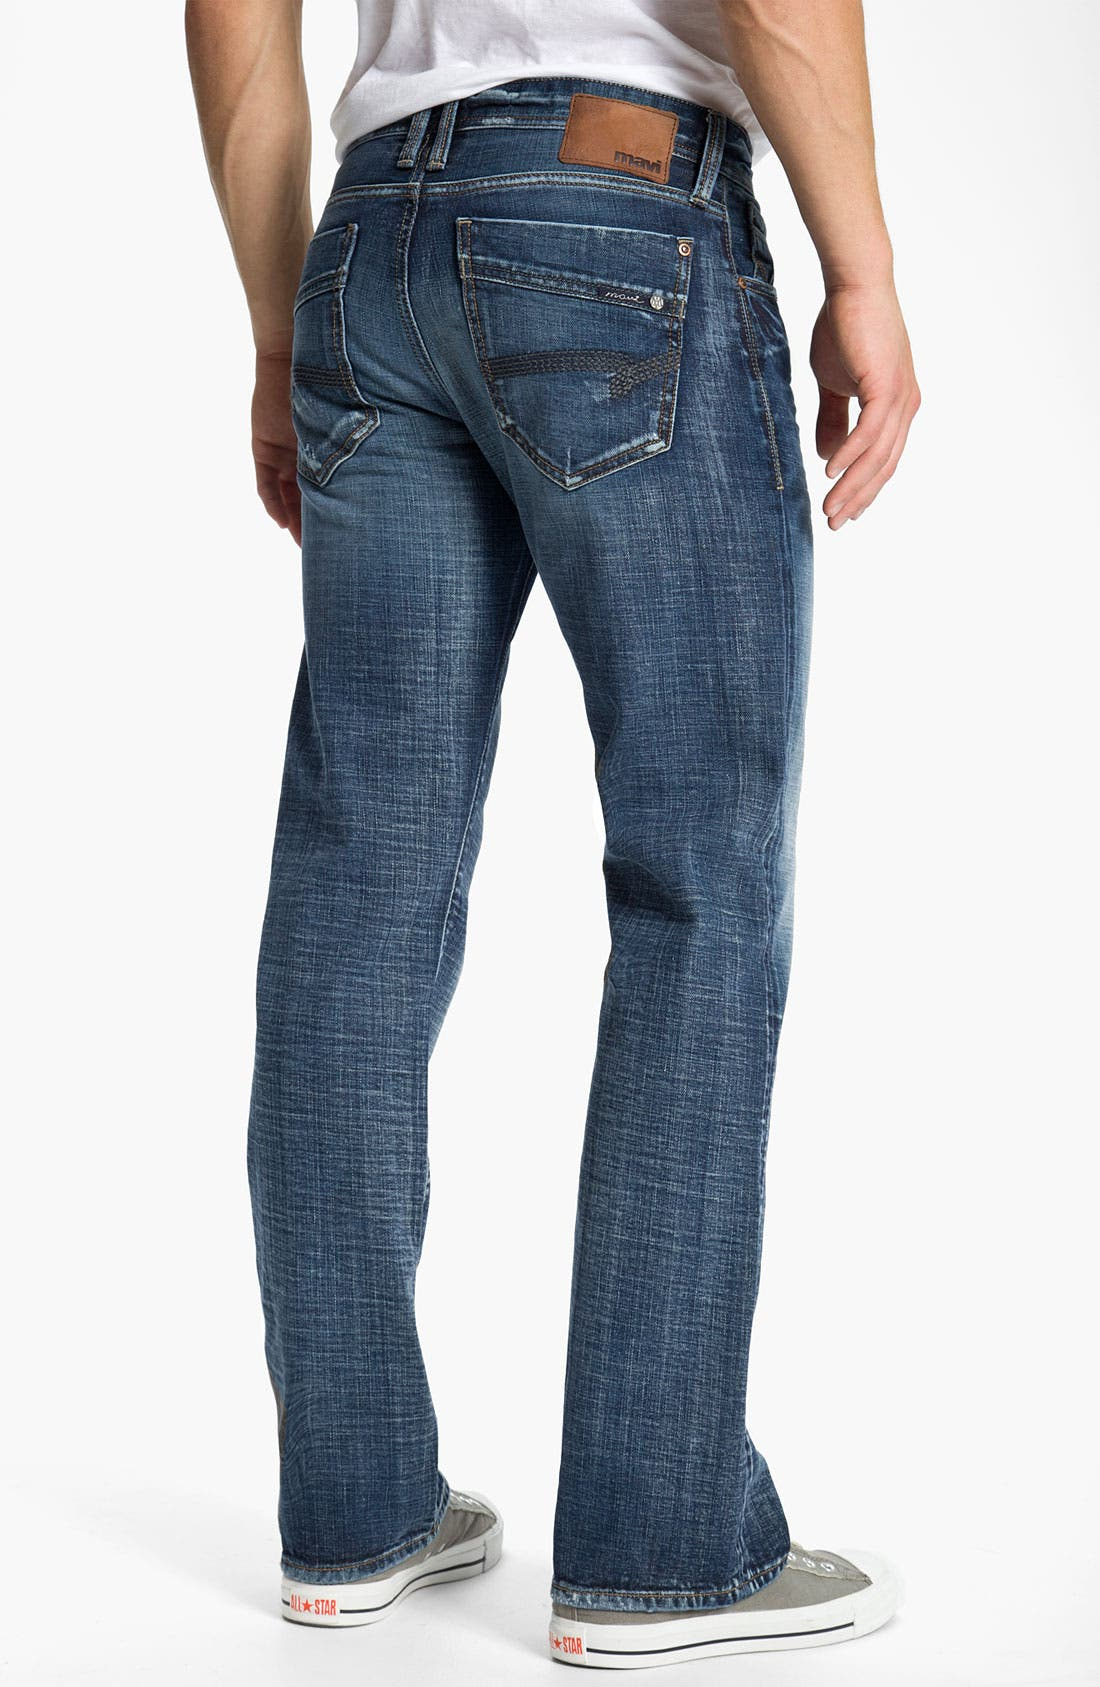 Alternate Image 1 Selected - Mavi Jeans 'Josh' Bootcut Jeans (Dark American Cashmere)